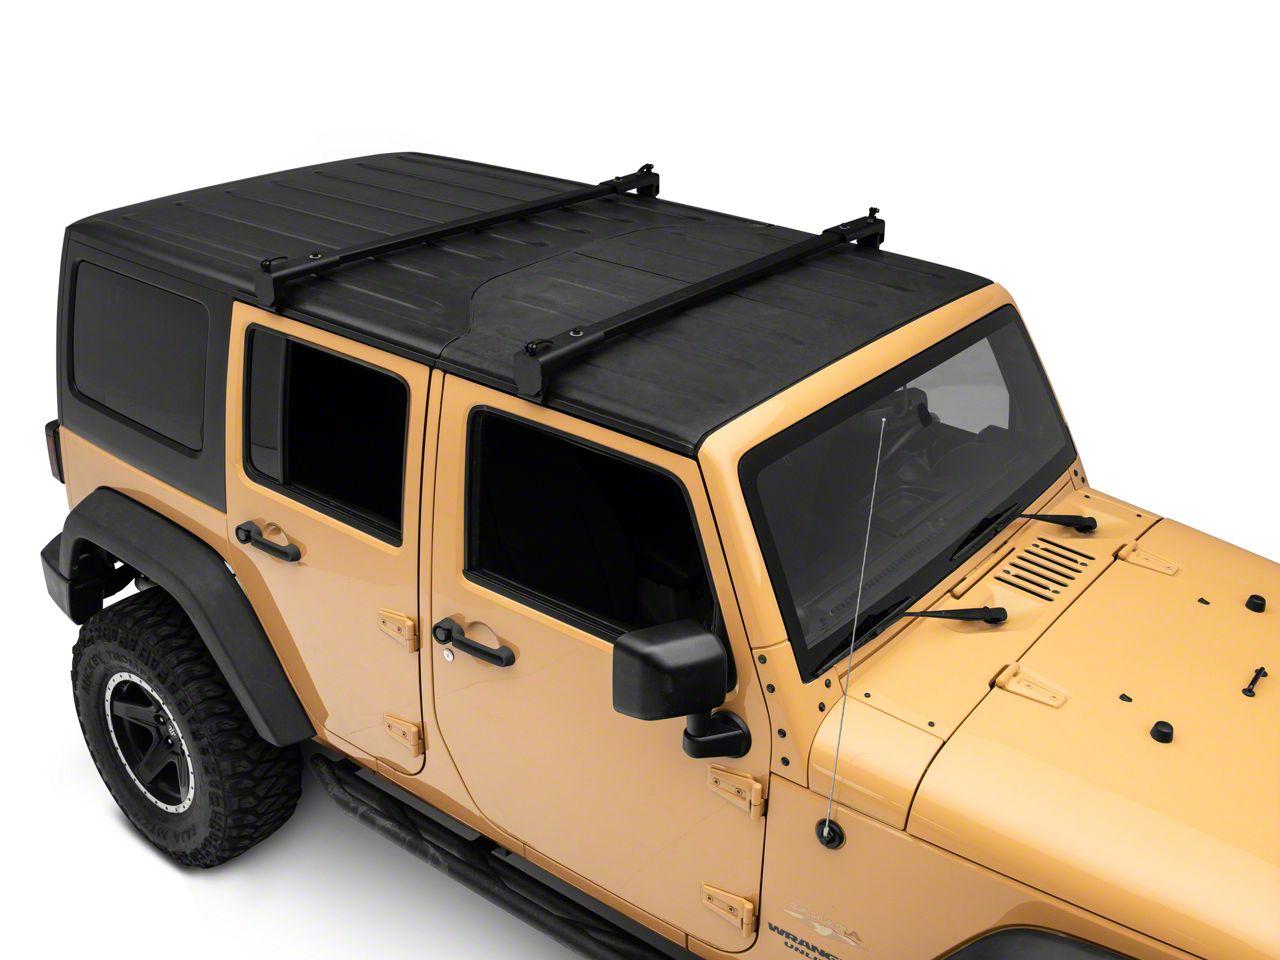 Barricade Jeep Wrangler Two Bar Removable Roof Rack J132753 07 18 Jeep Wrangler Jk 4 Door